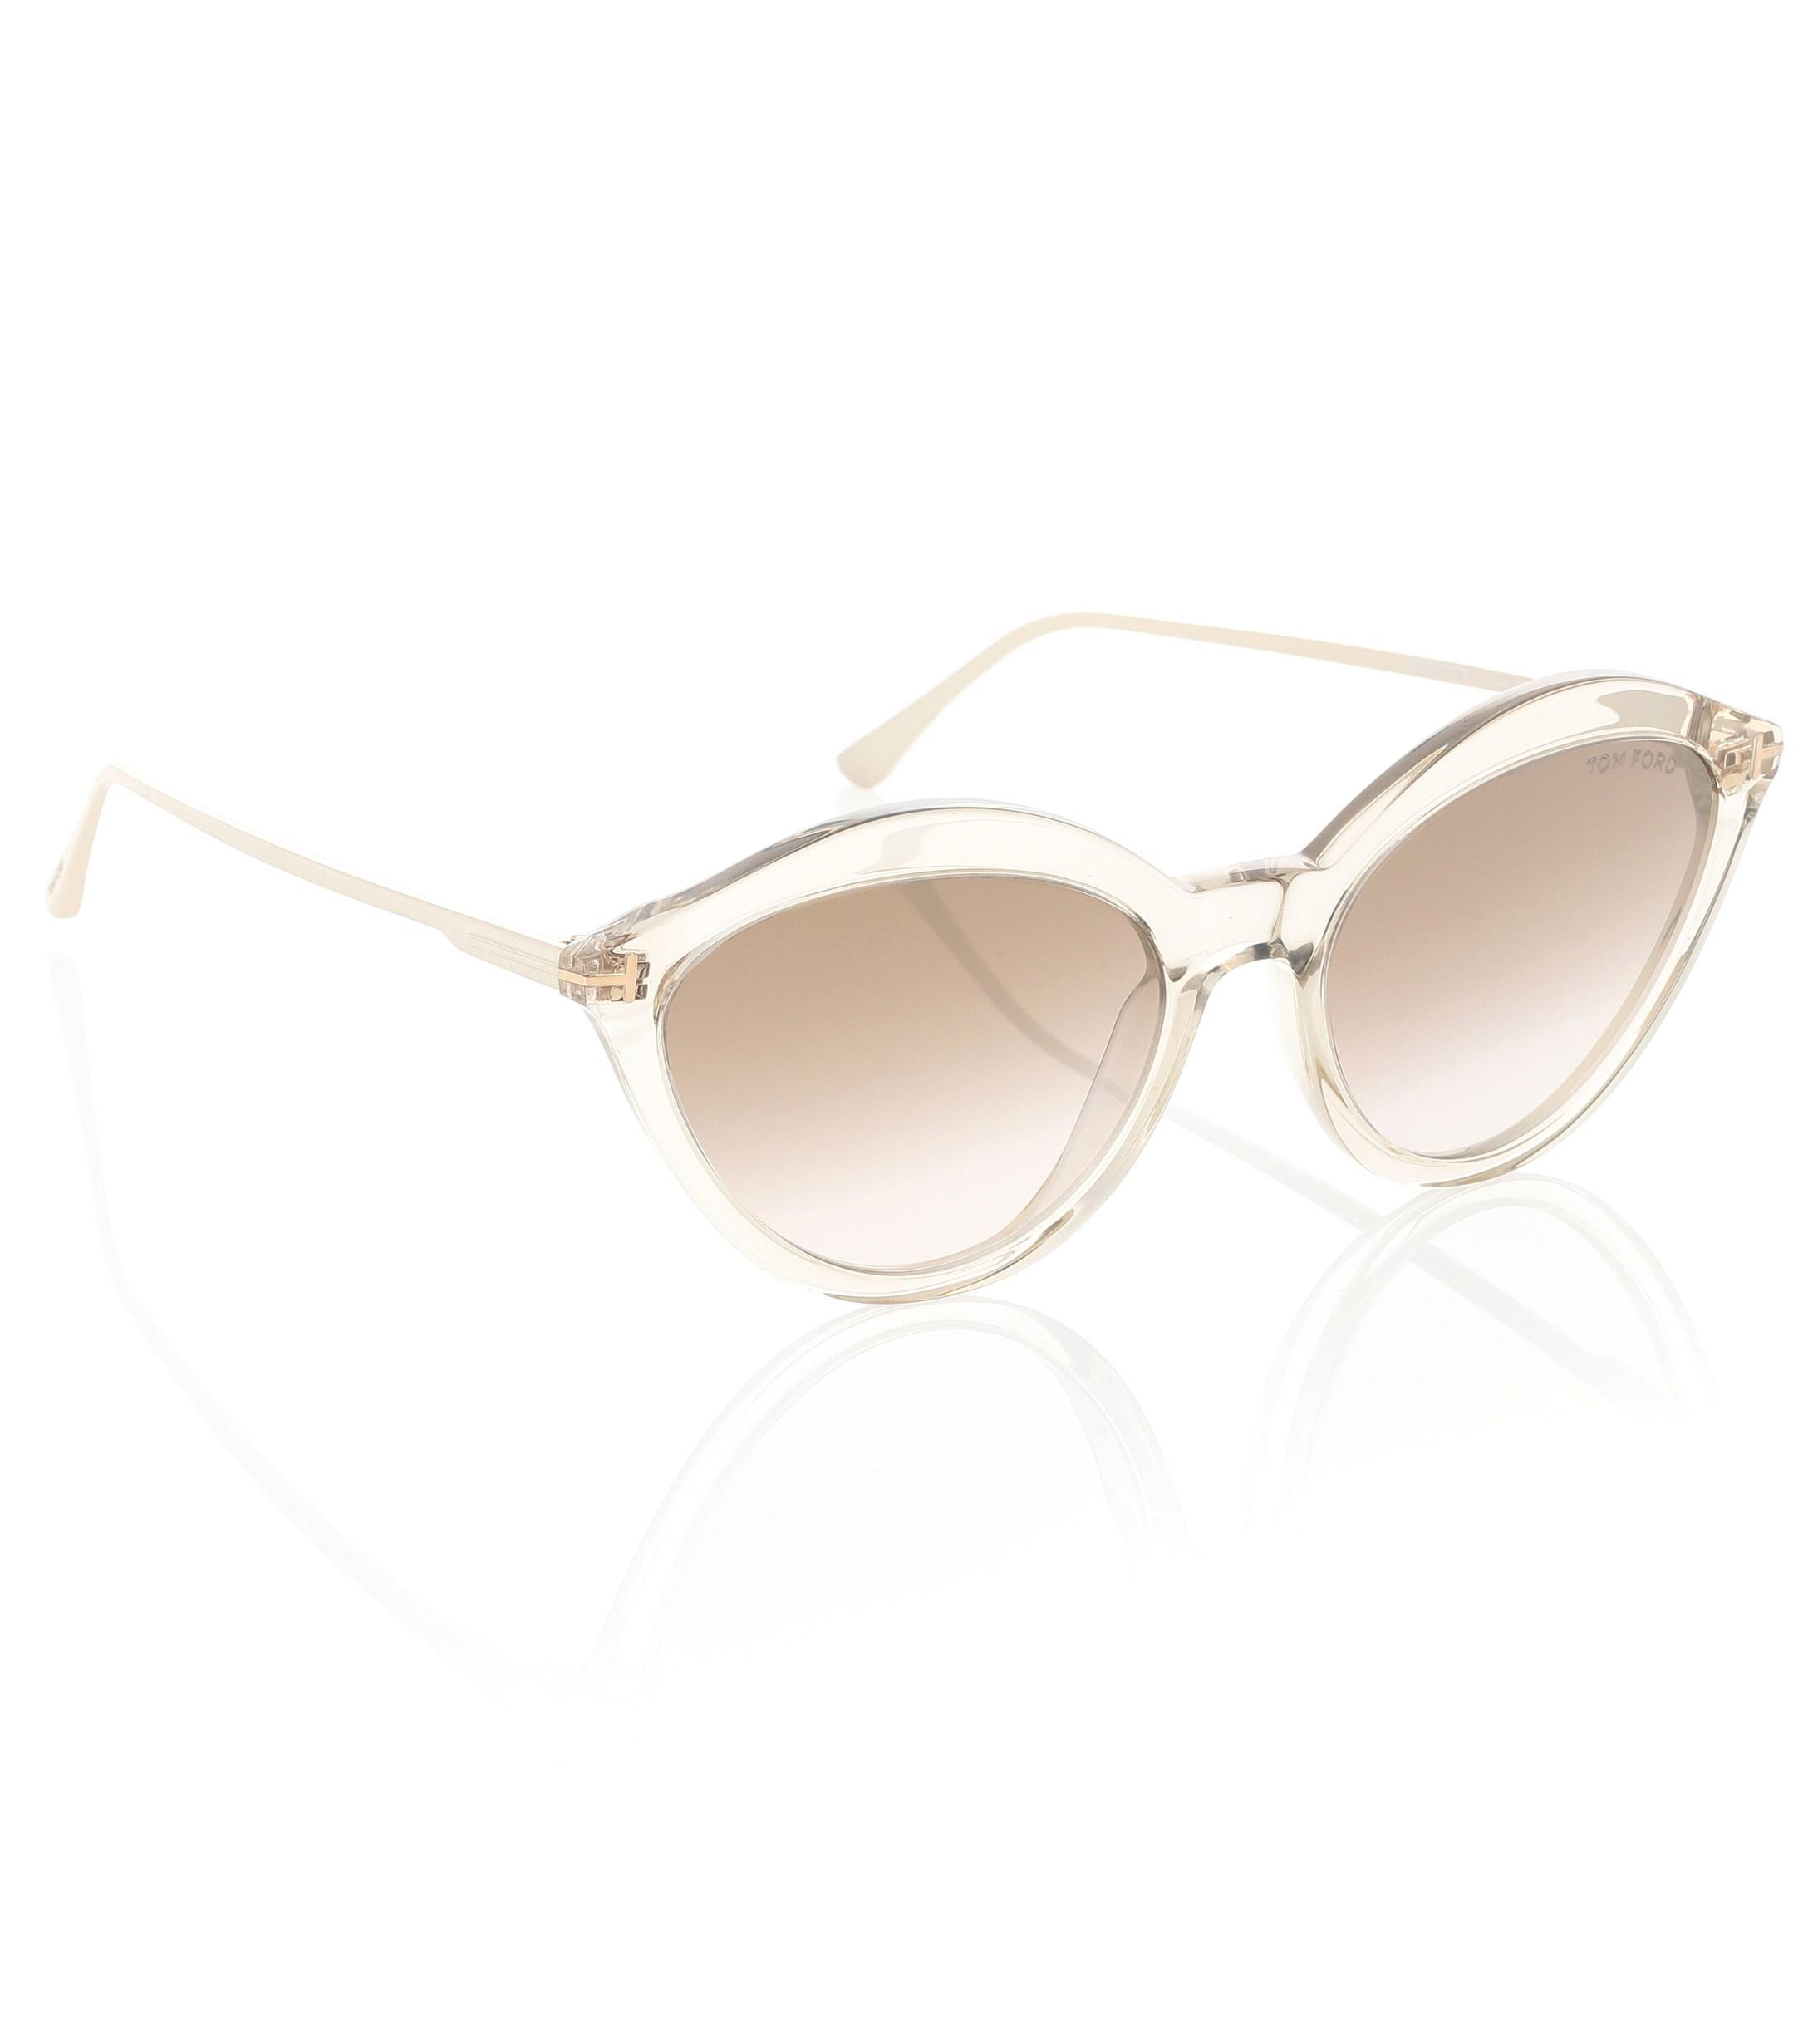 Chloé Cat Lyst Tom Sunglasses Ford In Brown Eye AE861q